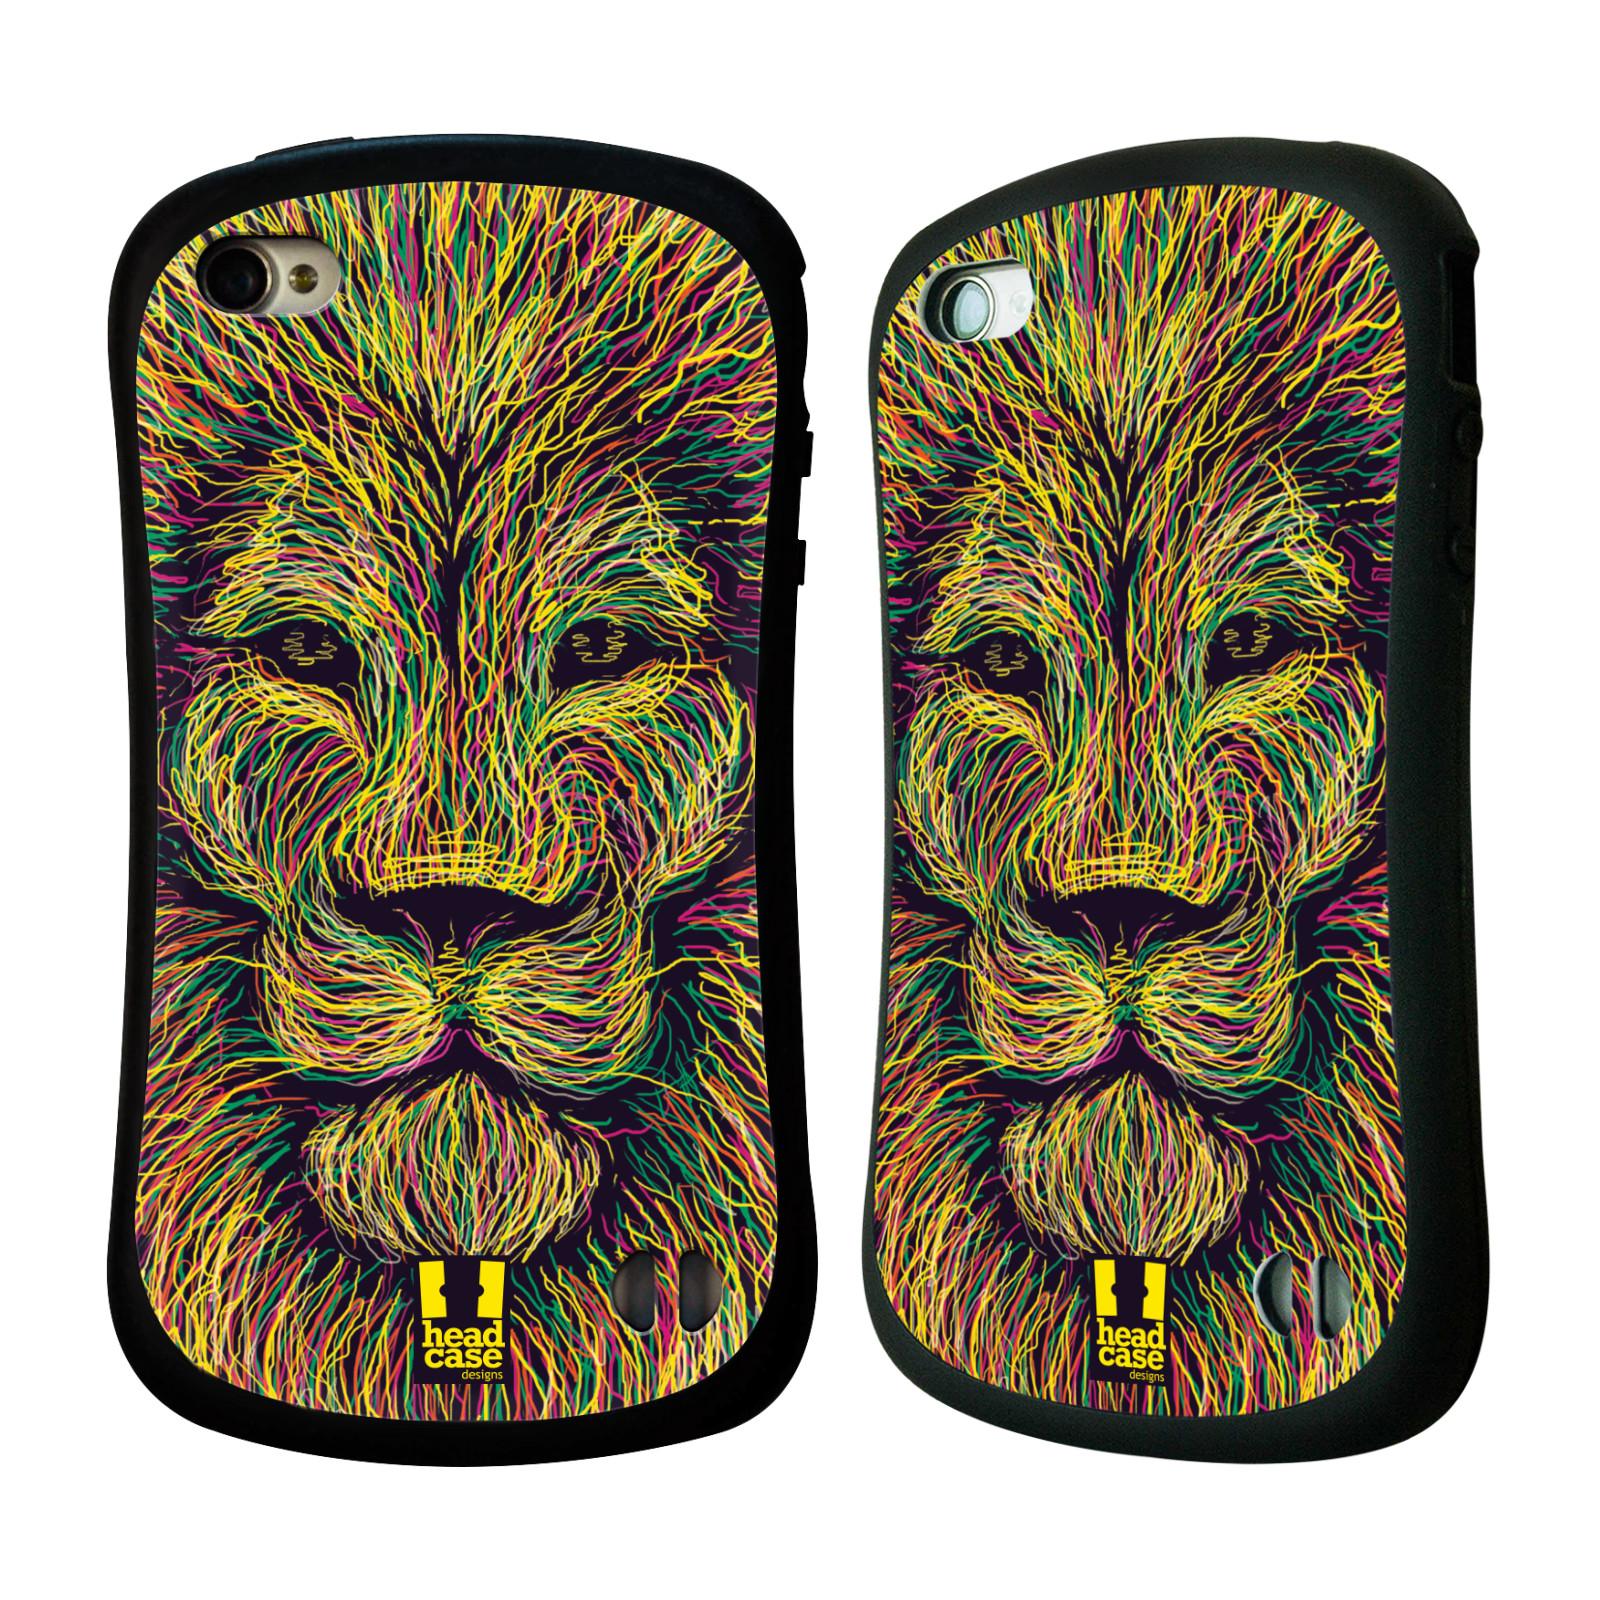 HEAD CASE silikon/plast odolný obal na mobil Apple Iphone 4/4S vzor zvíře čmáranice lev